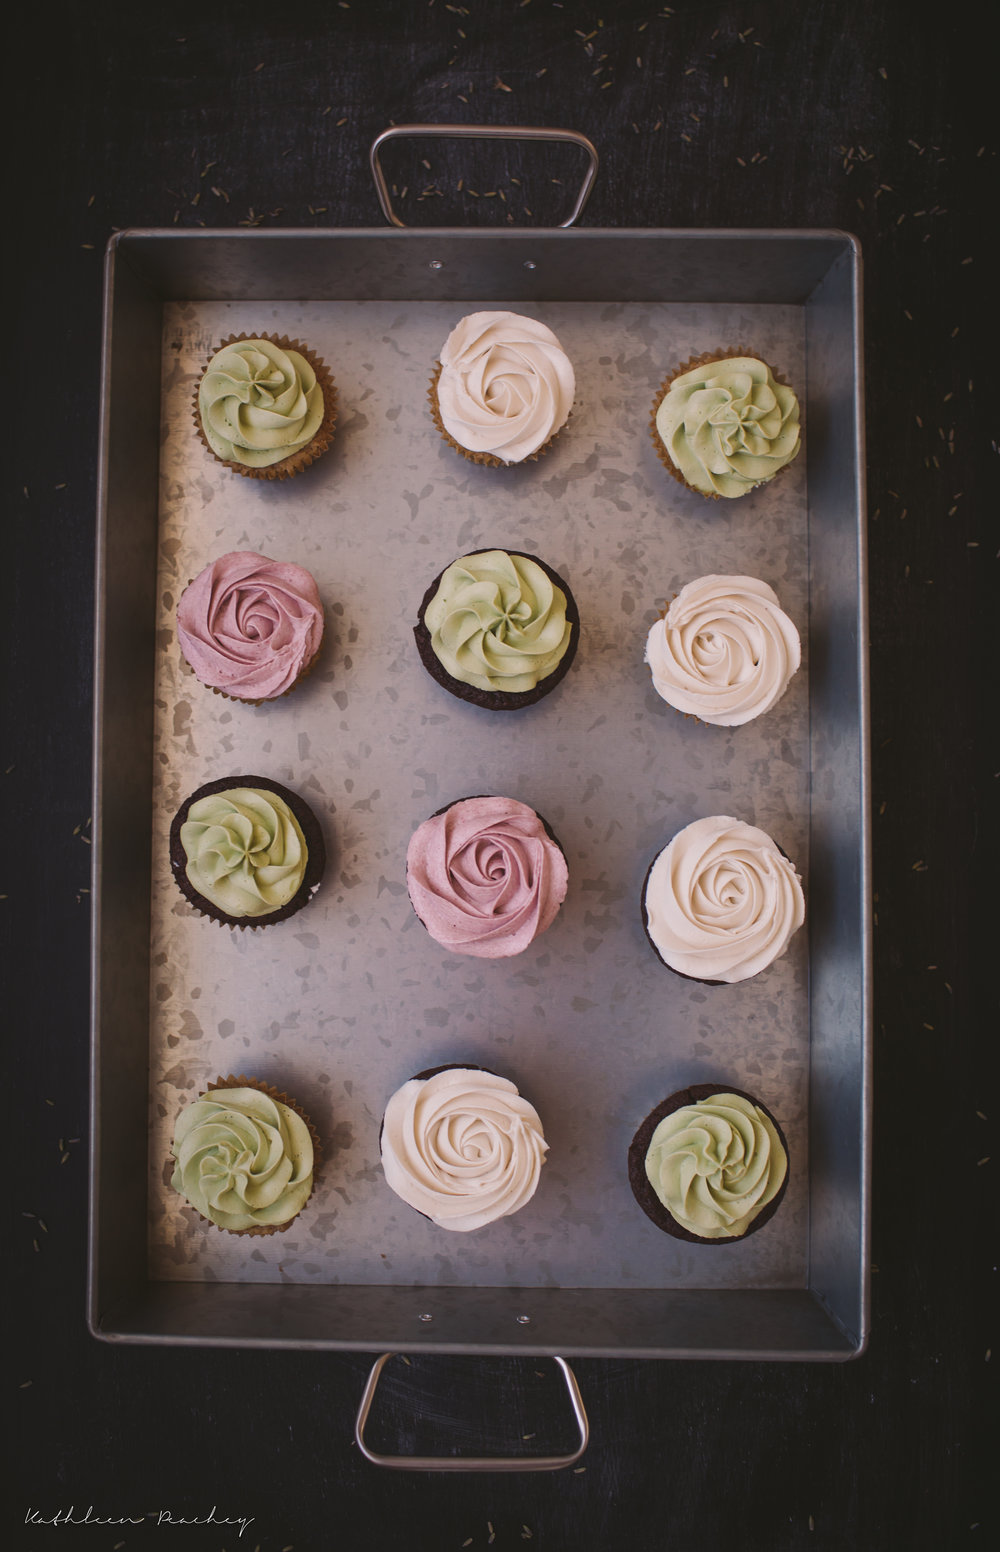 kathleen peachey photography allergen free bakes